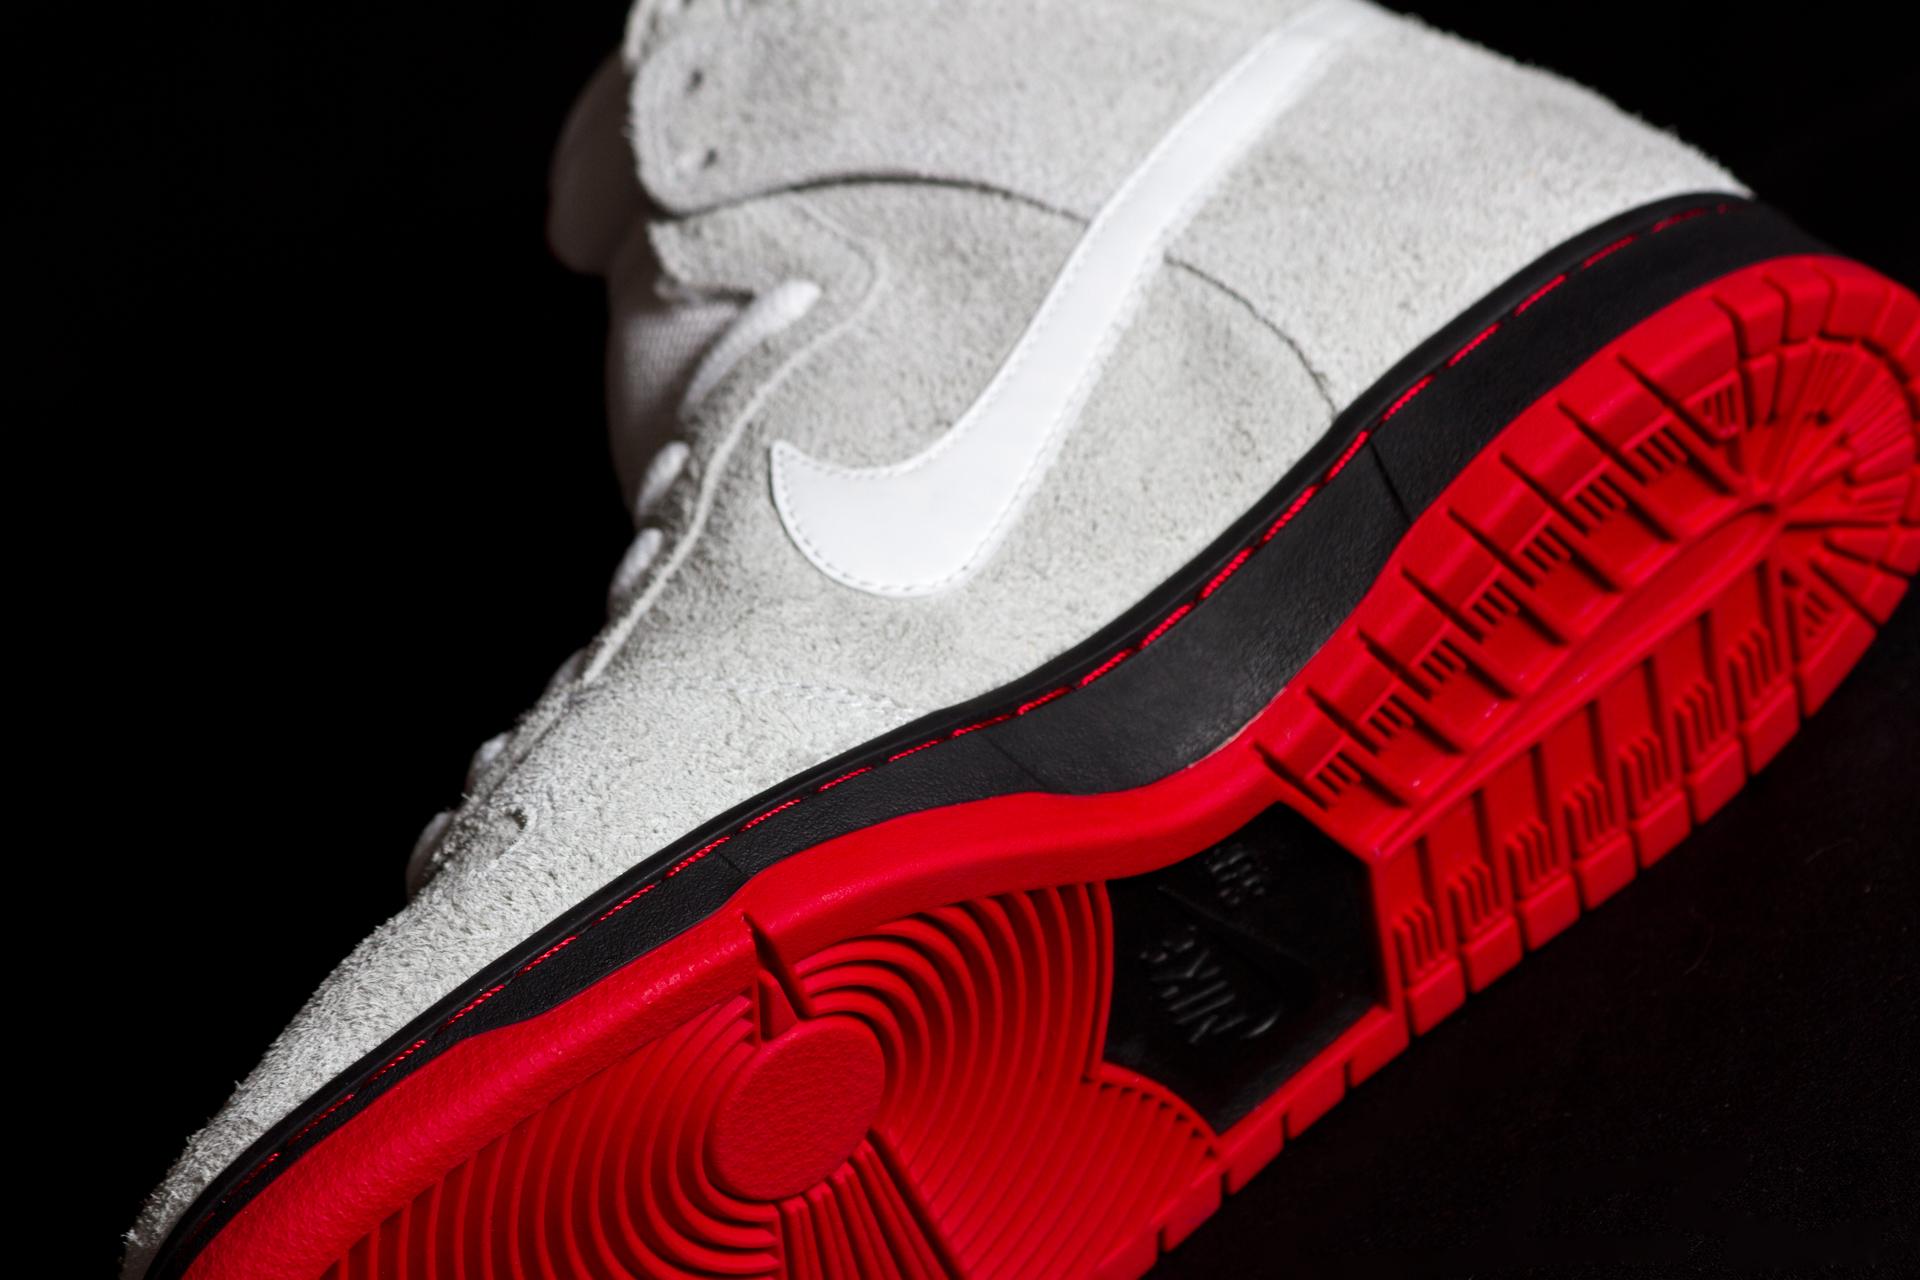 NikeSB_DunkHi_BlackSheep_SoleDetail